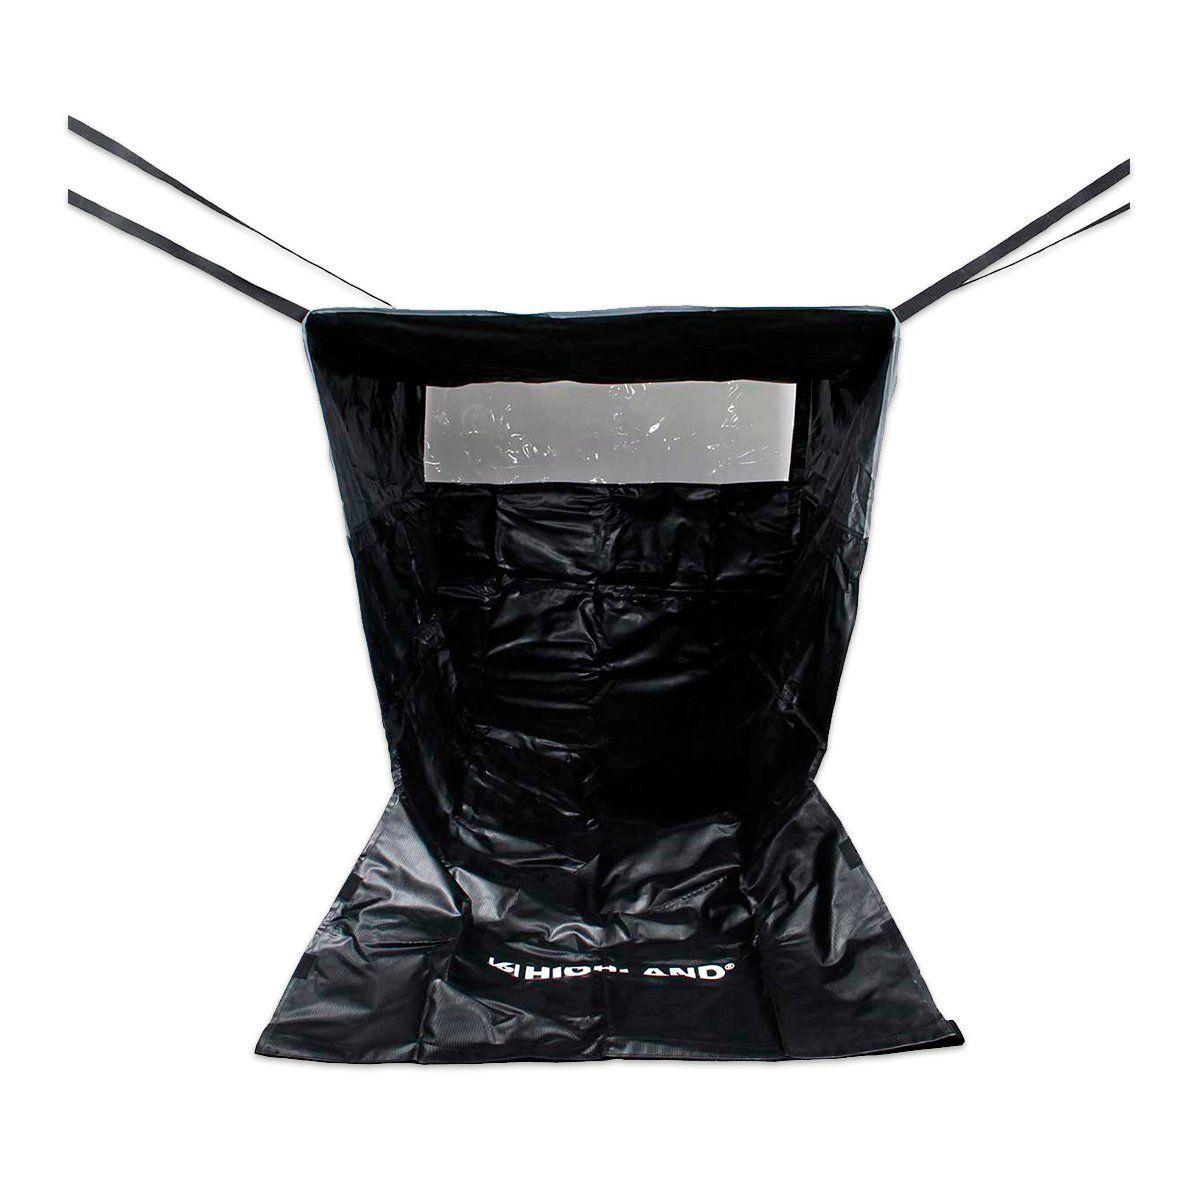 Protetor de Bagagem Carga p/ Porta-malas e SUVs REESE